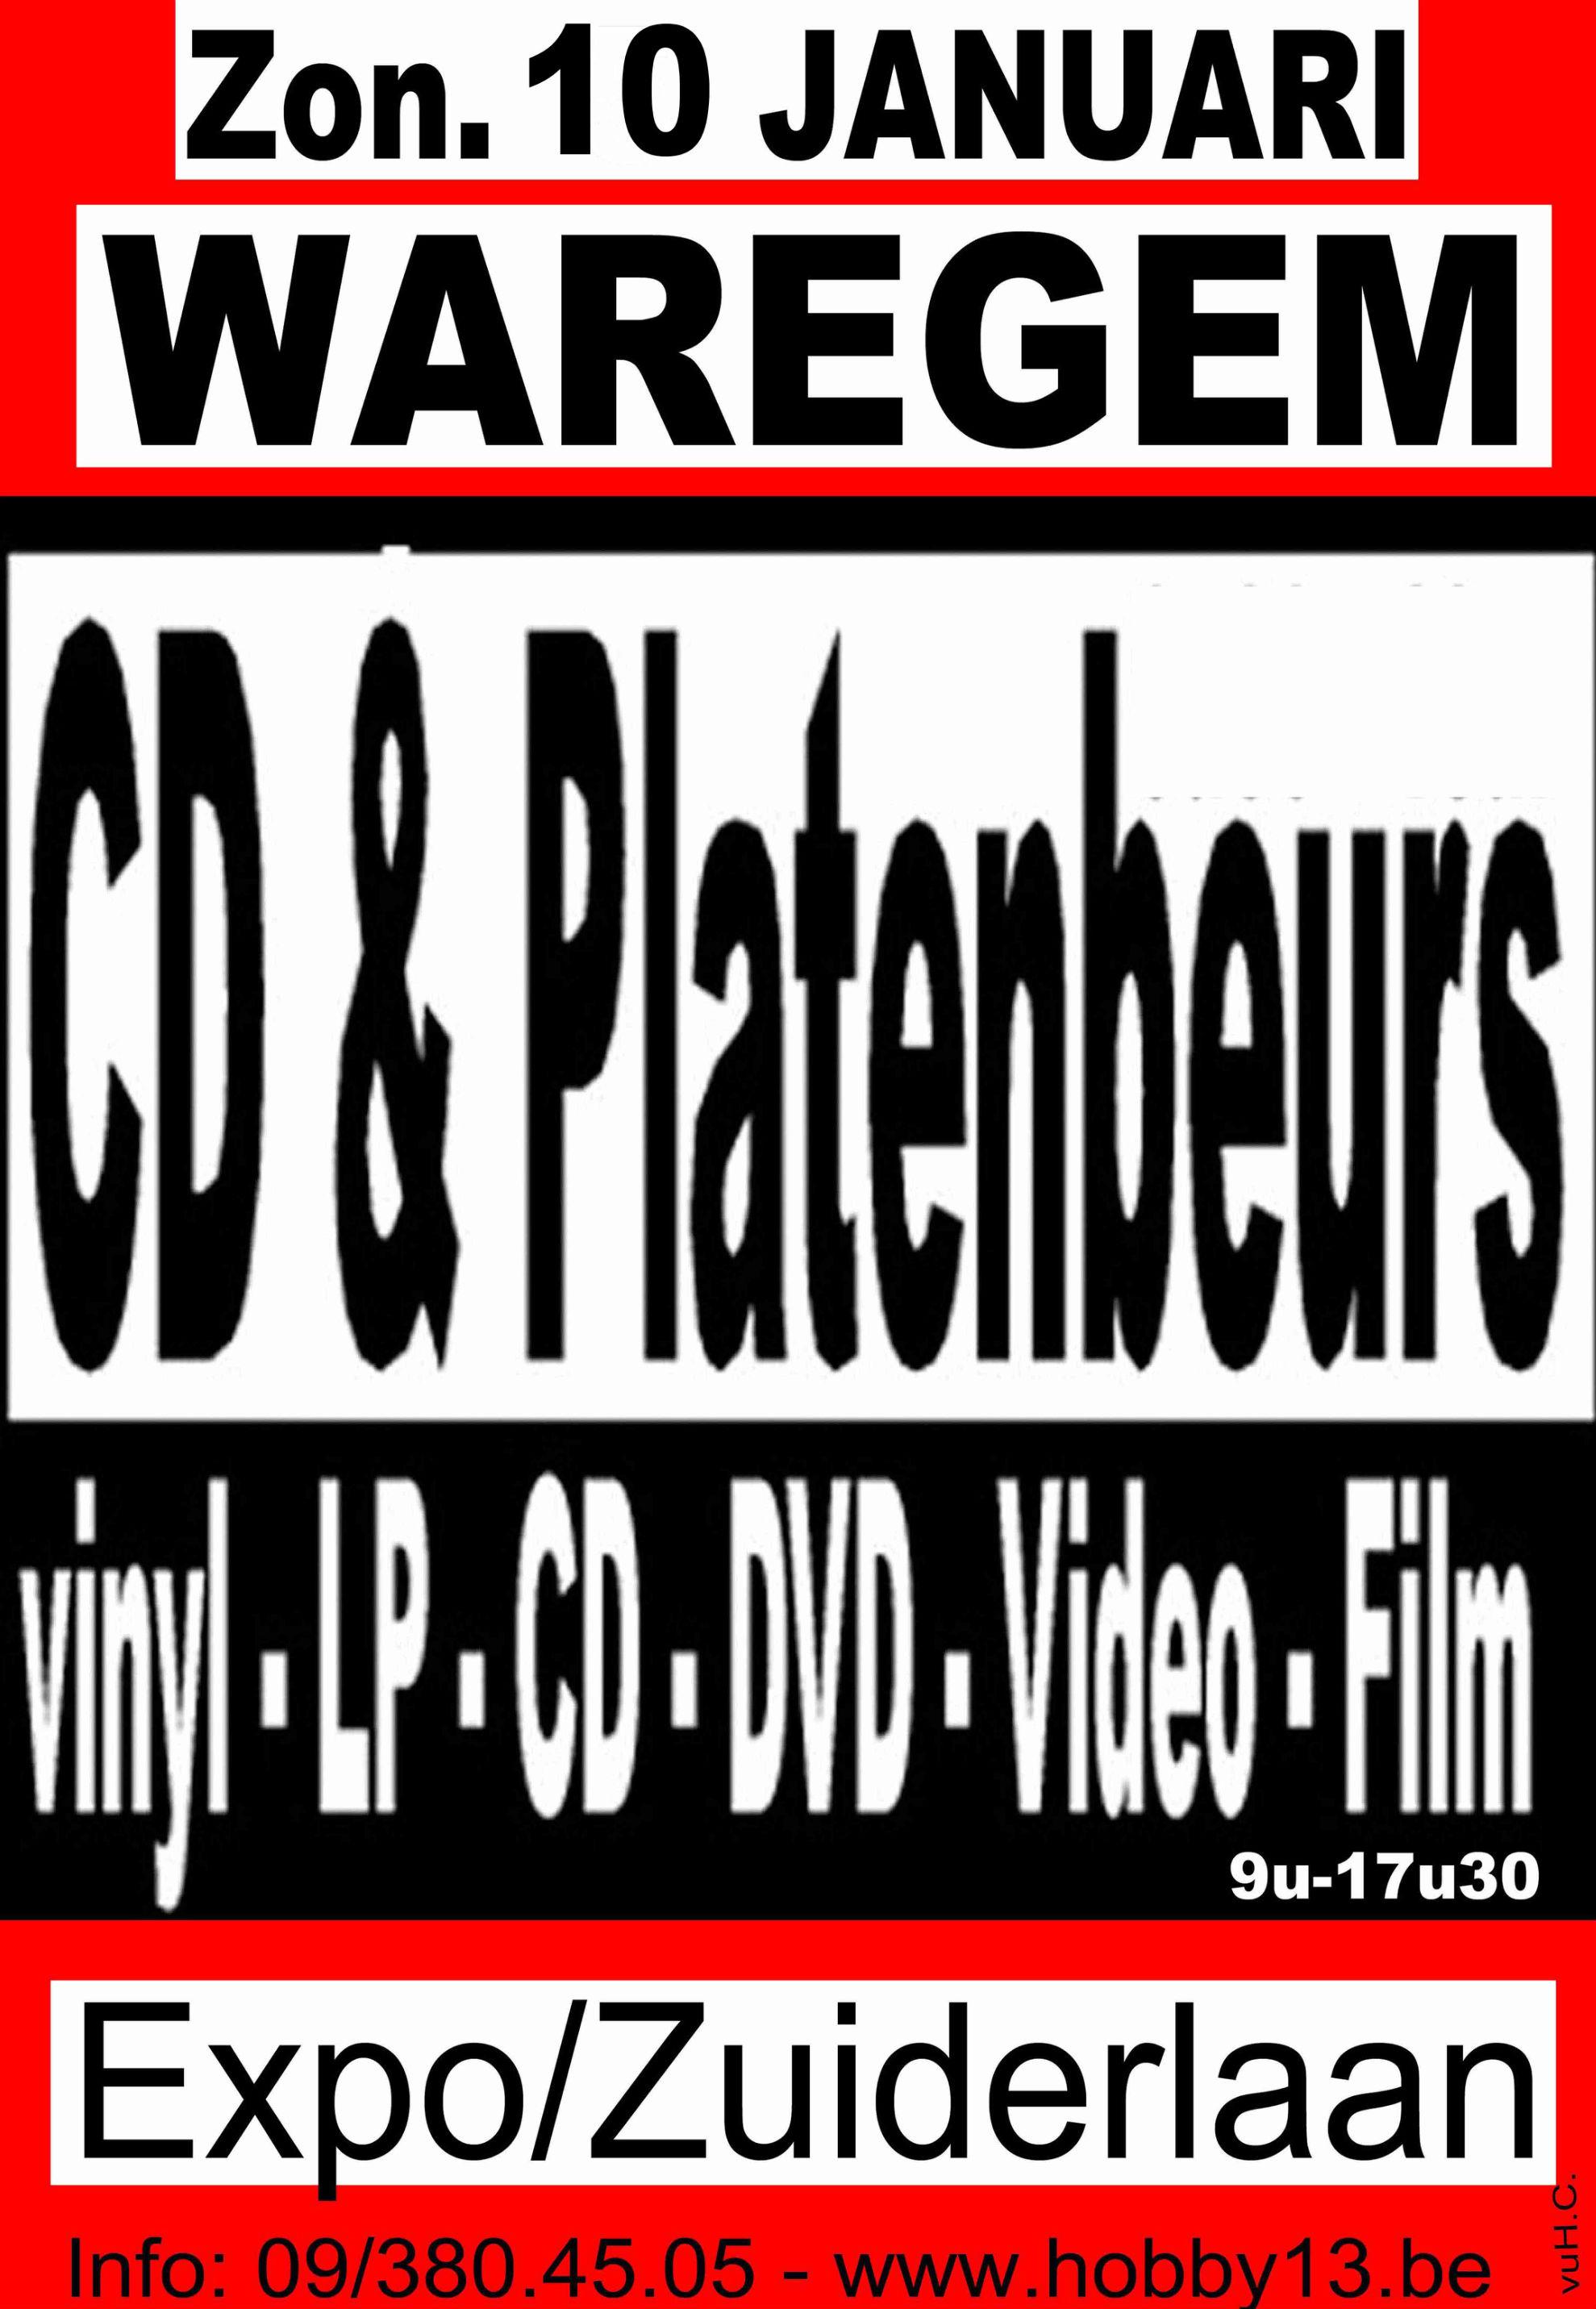 Rommelplaneet, CD & Platenbeurs